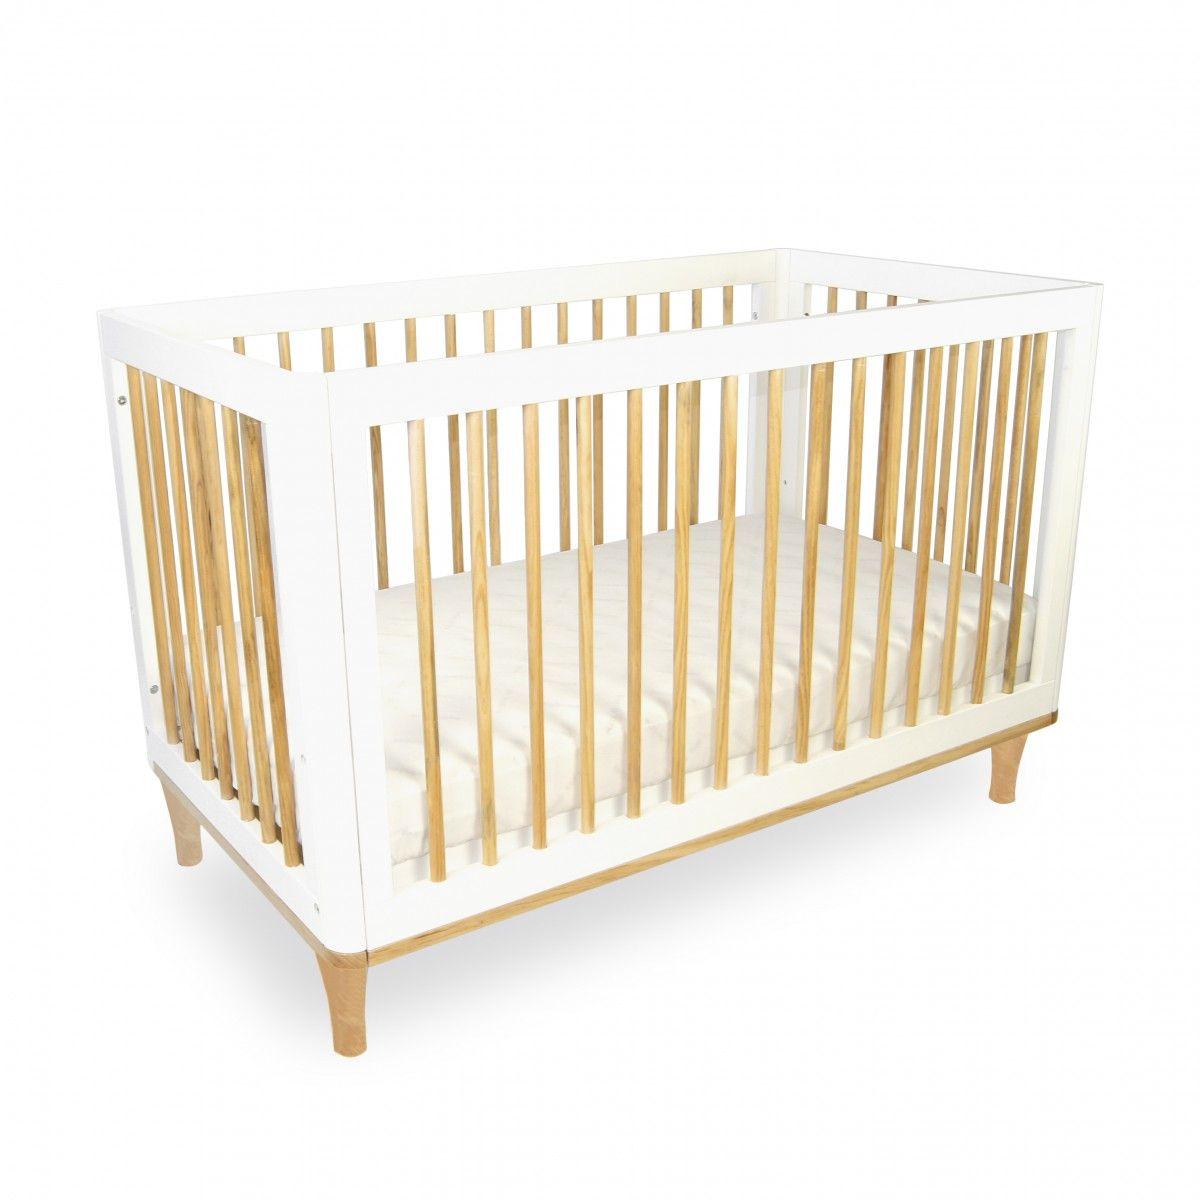 Babyhood Riya Cot + Mattress + Bonus Travel Cosy Crib  sc 1 st  Pinterest & Babyhood Riya Cot + Mattress + Bonus Travel Cosy Crib | Cots ...